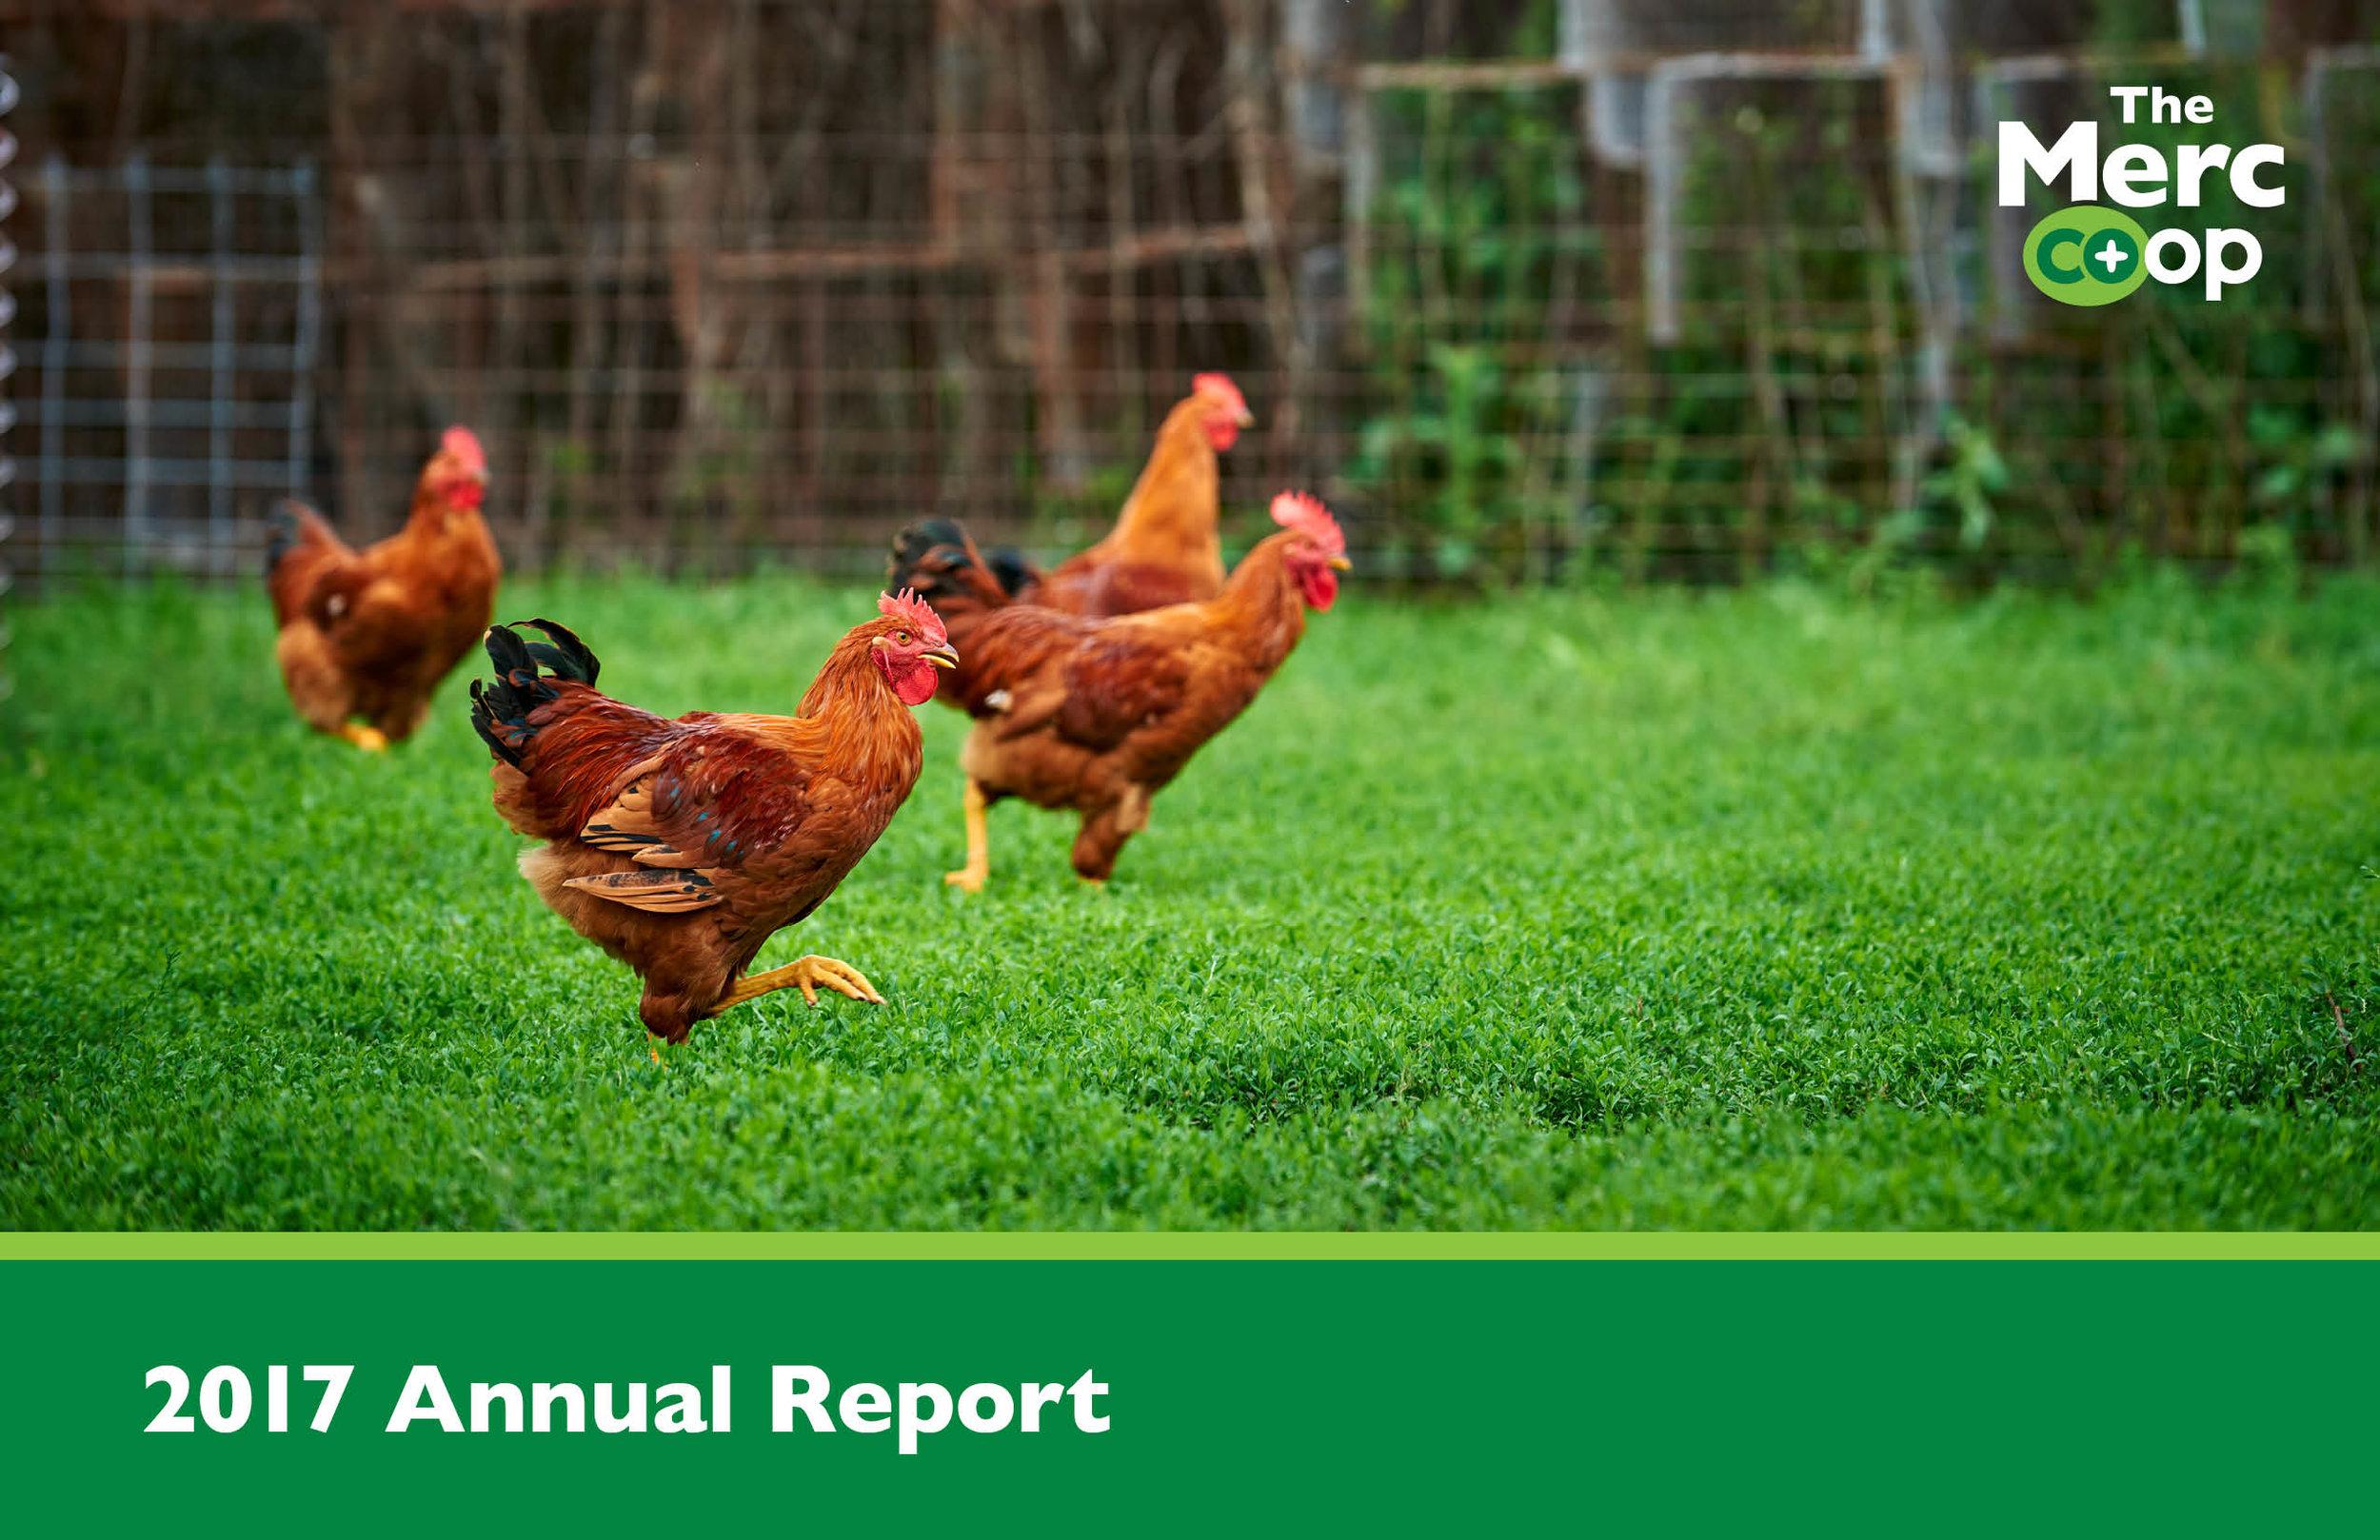 Merc_AnnualReport_2017.jpg